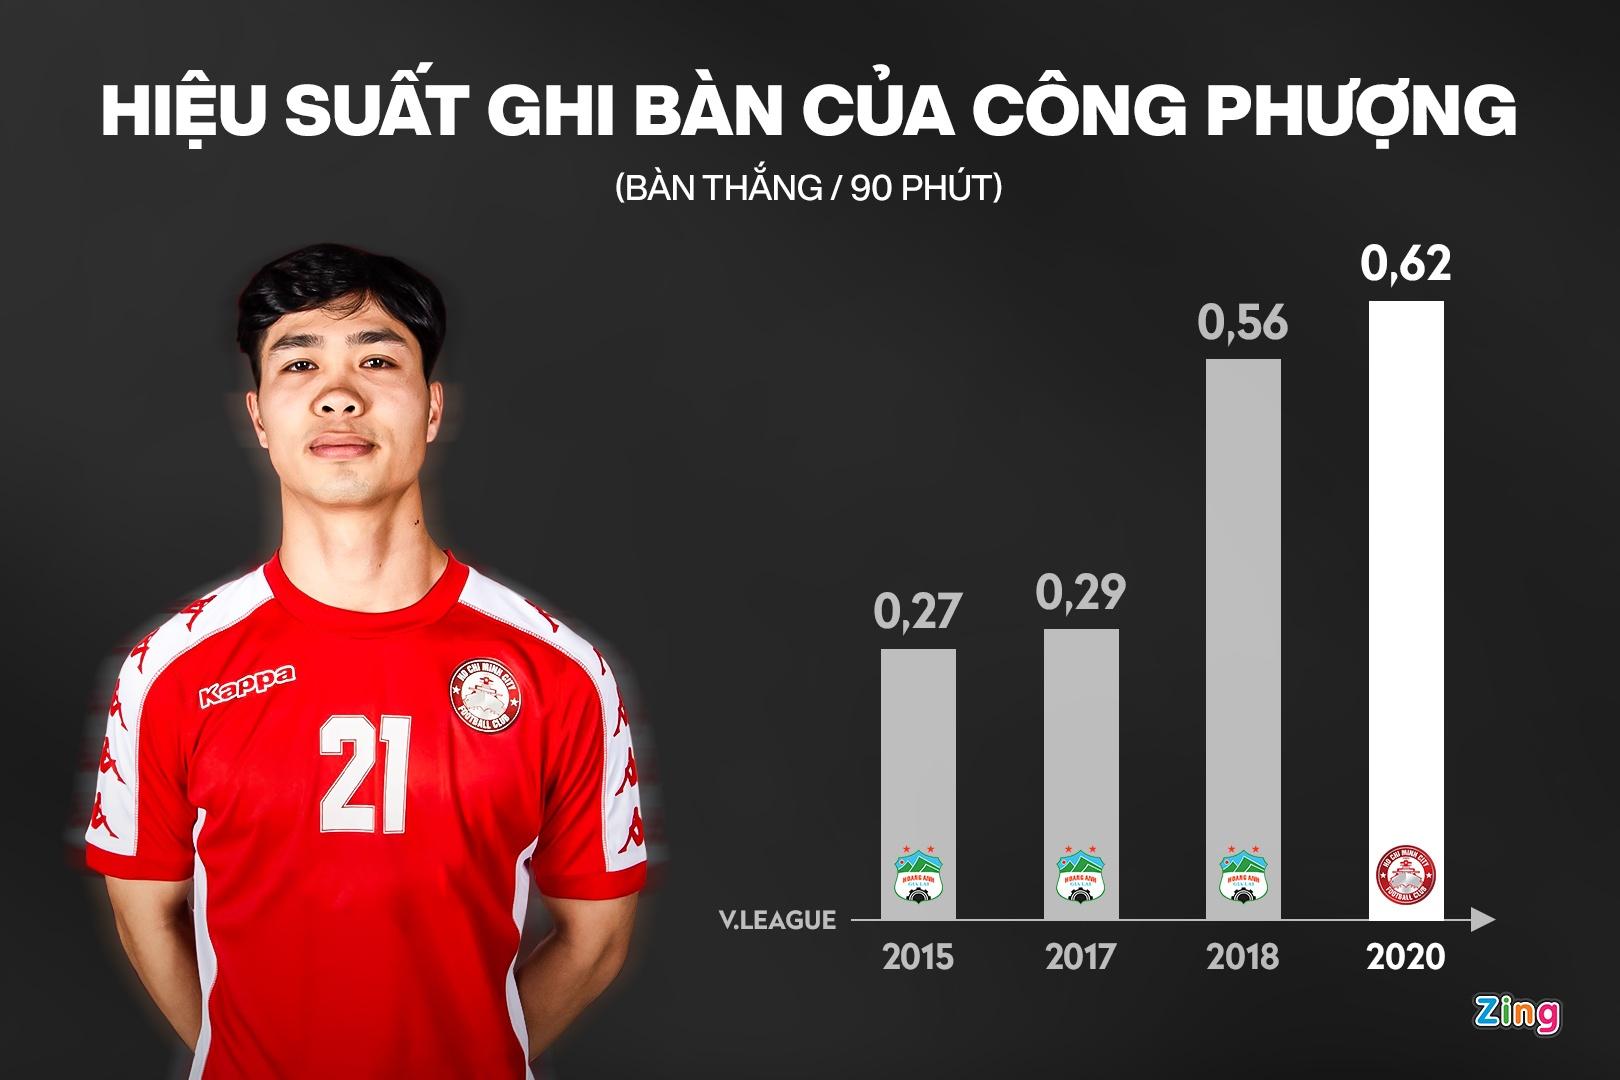 Cong Phuong anh 3